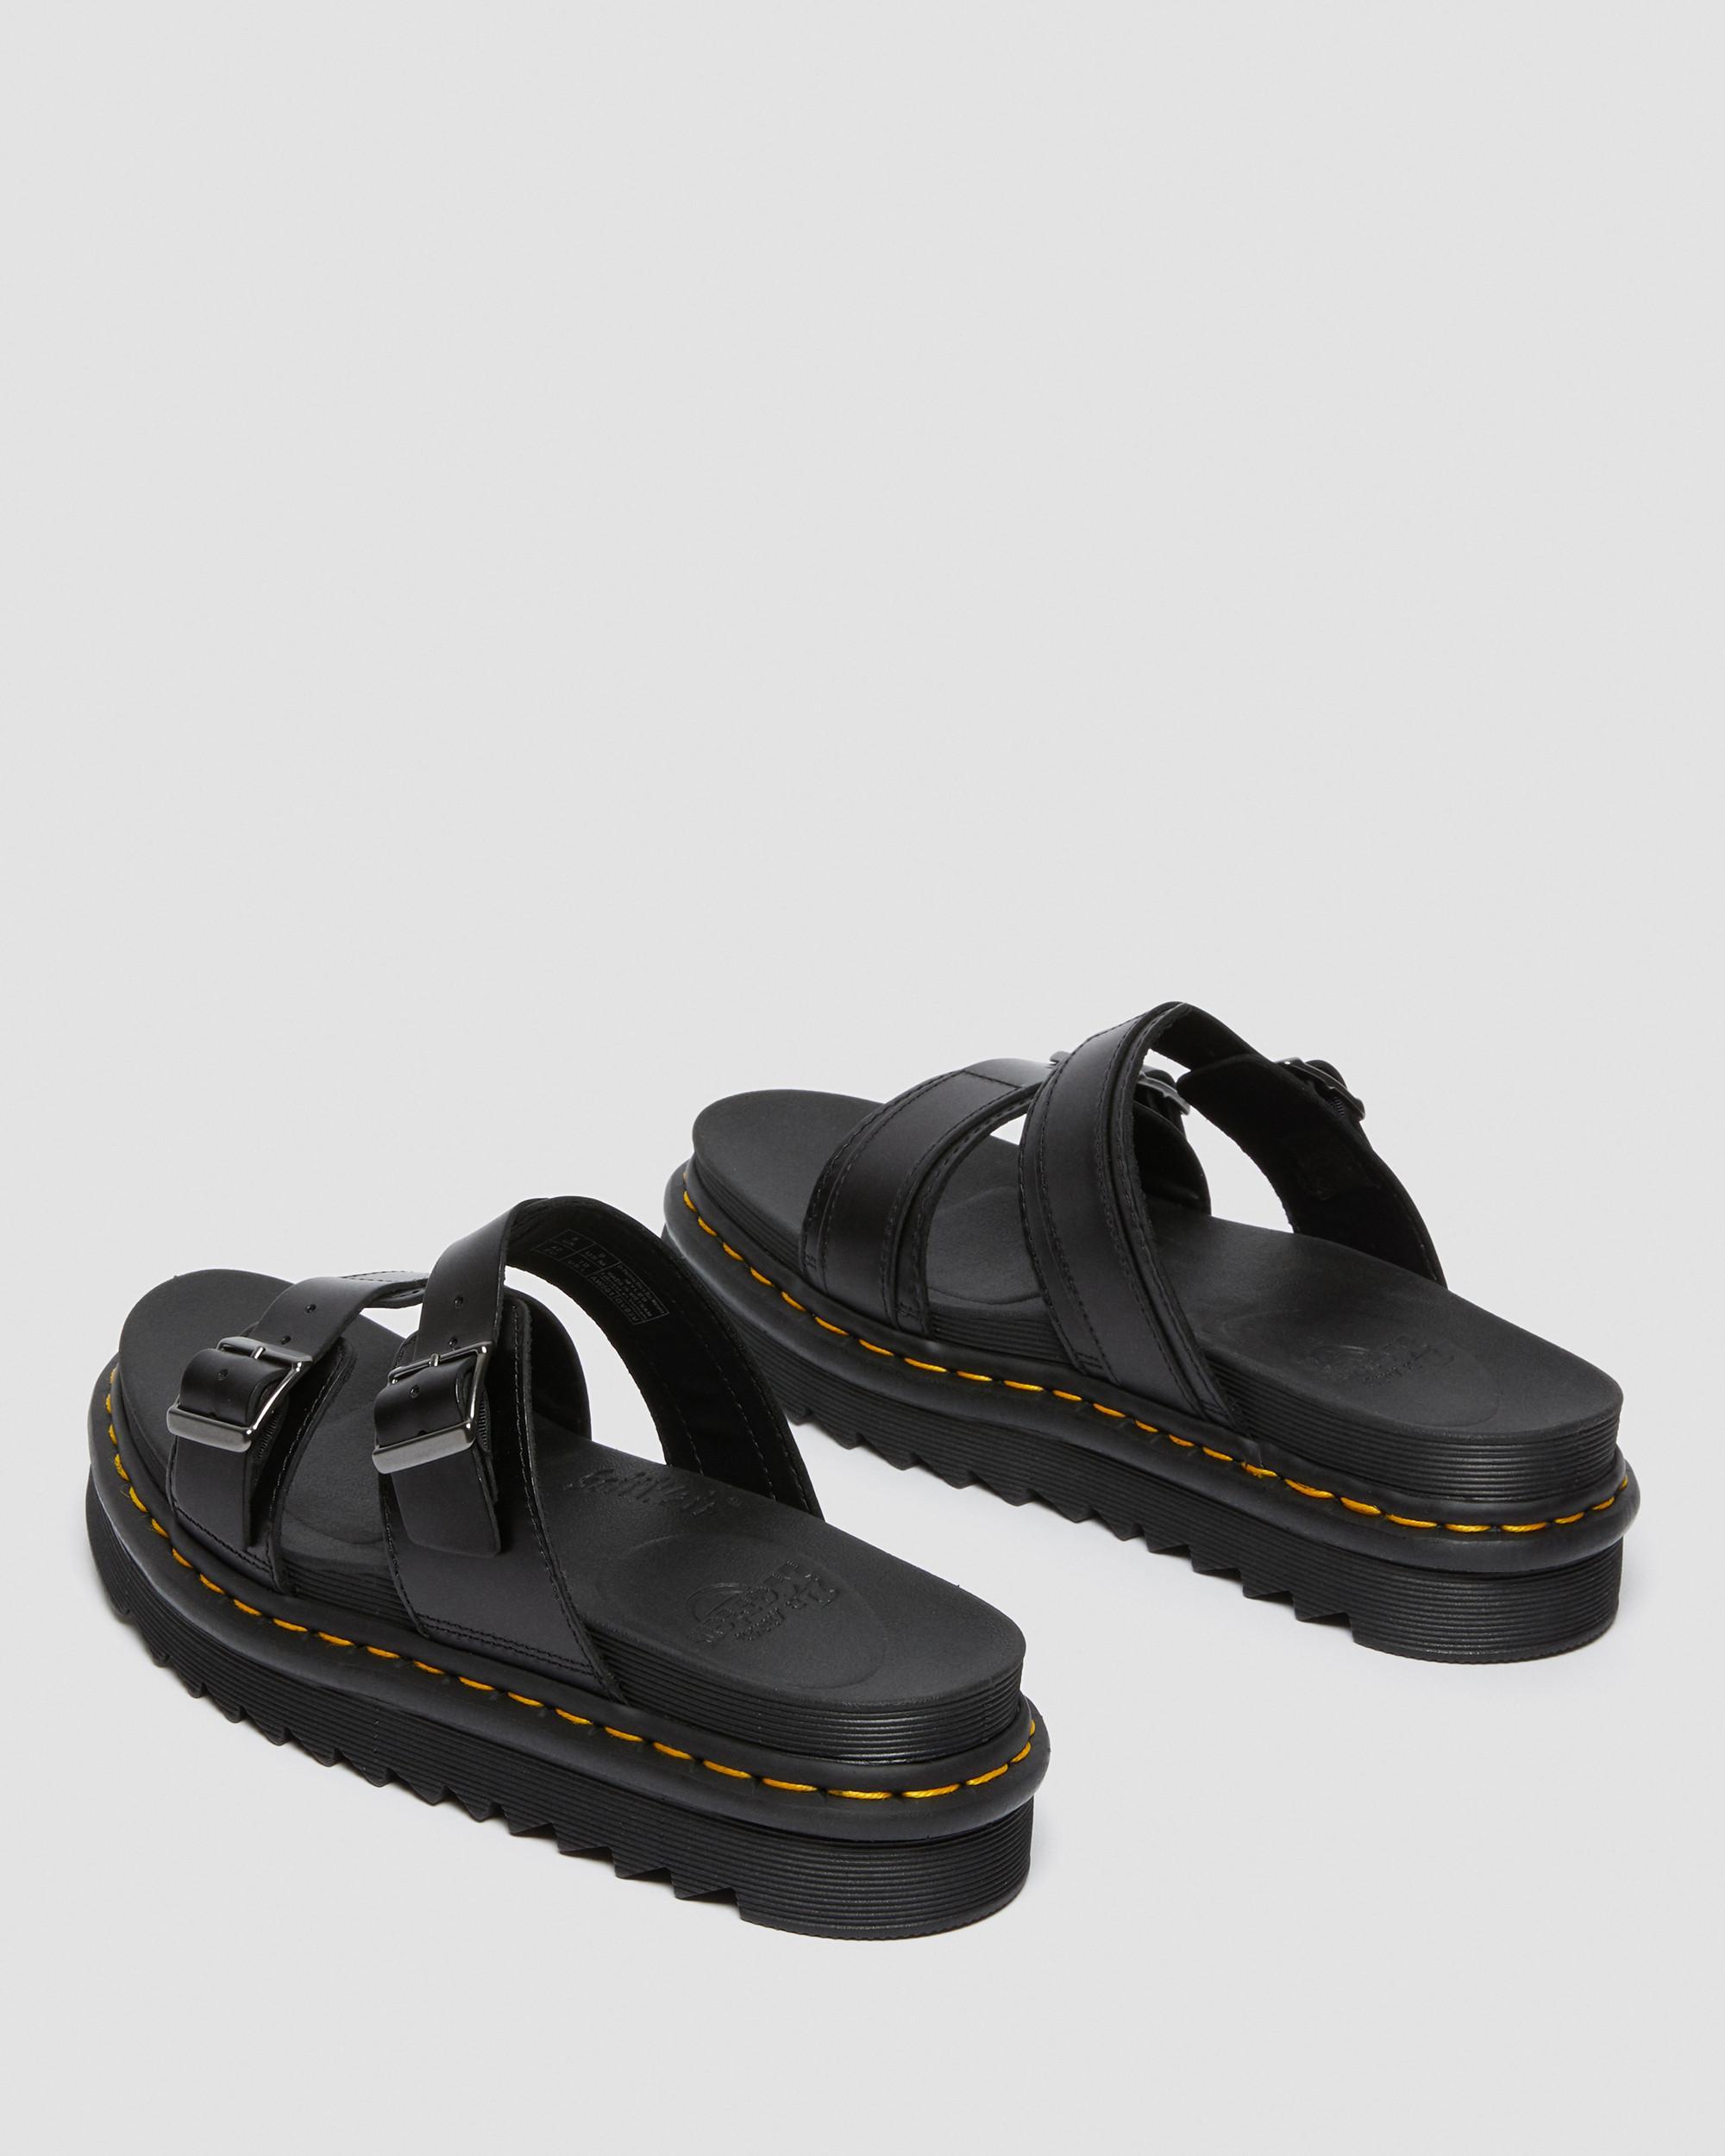 doc martens myles sandals